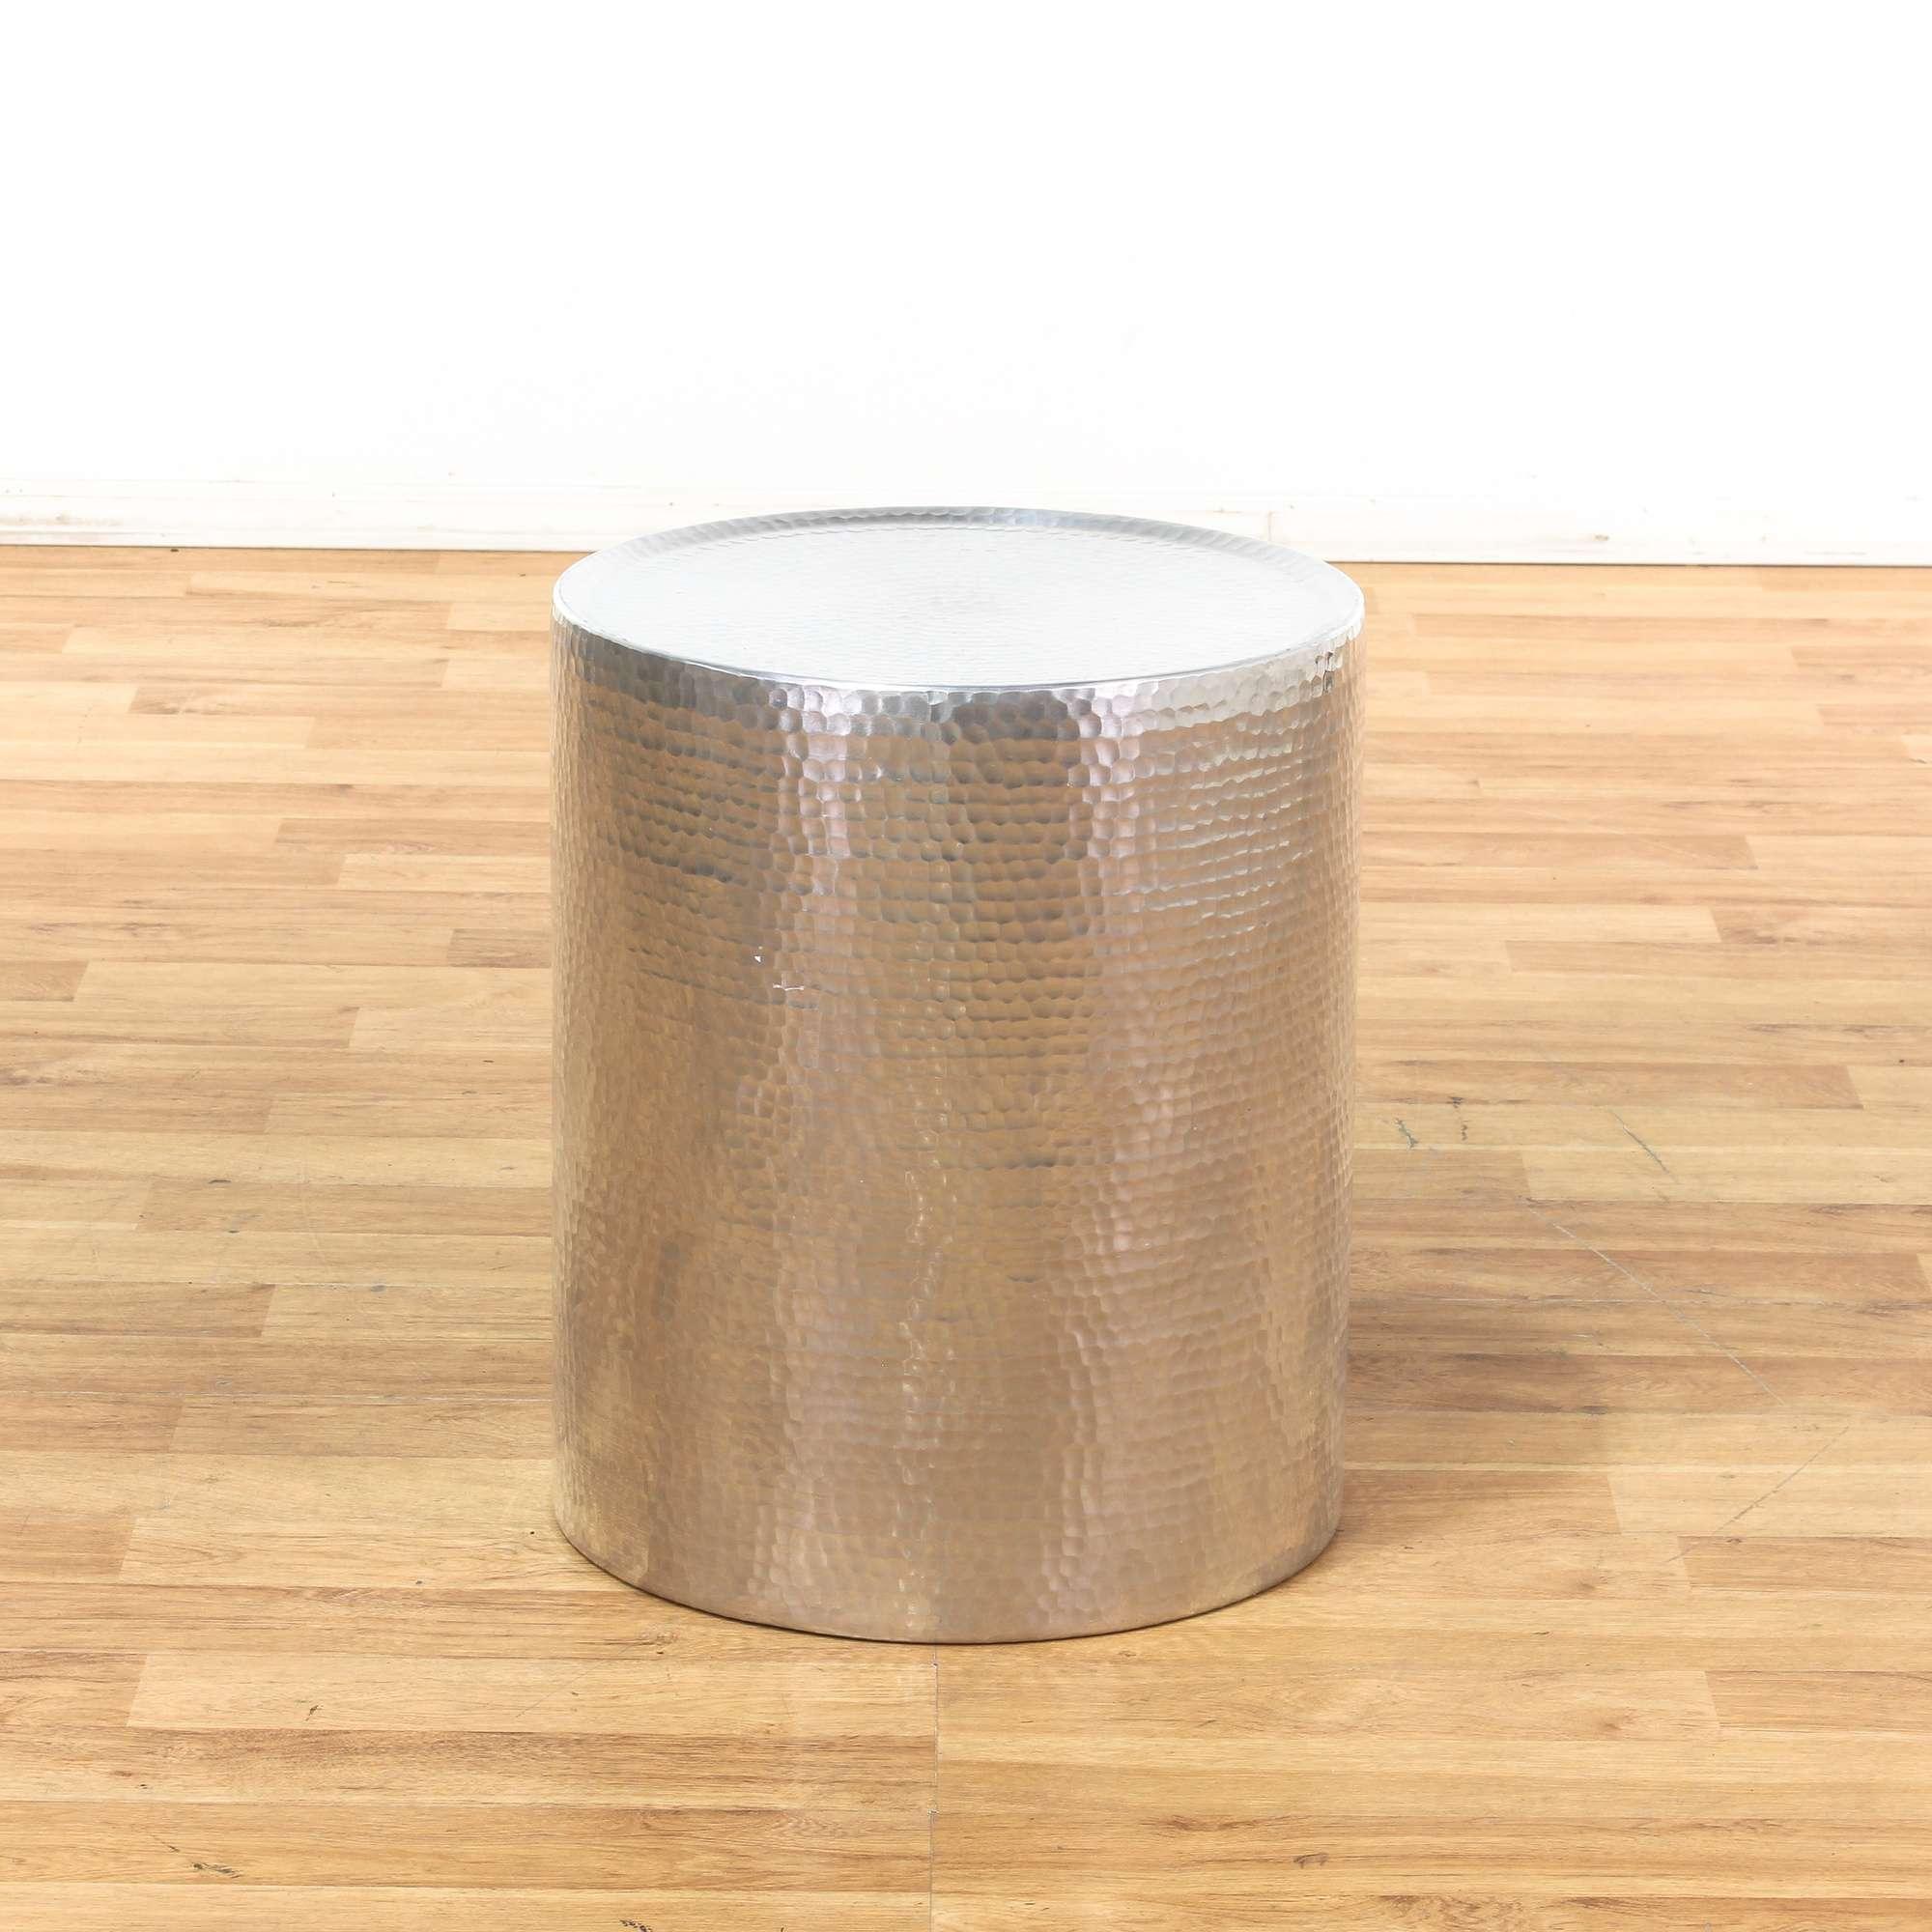 Hammered Silver Metallic Drum End Table Loveseat Vintage